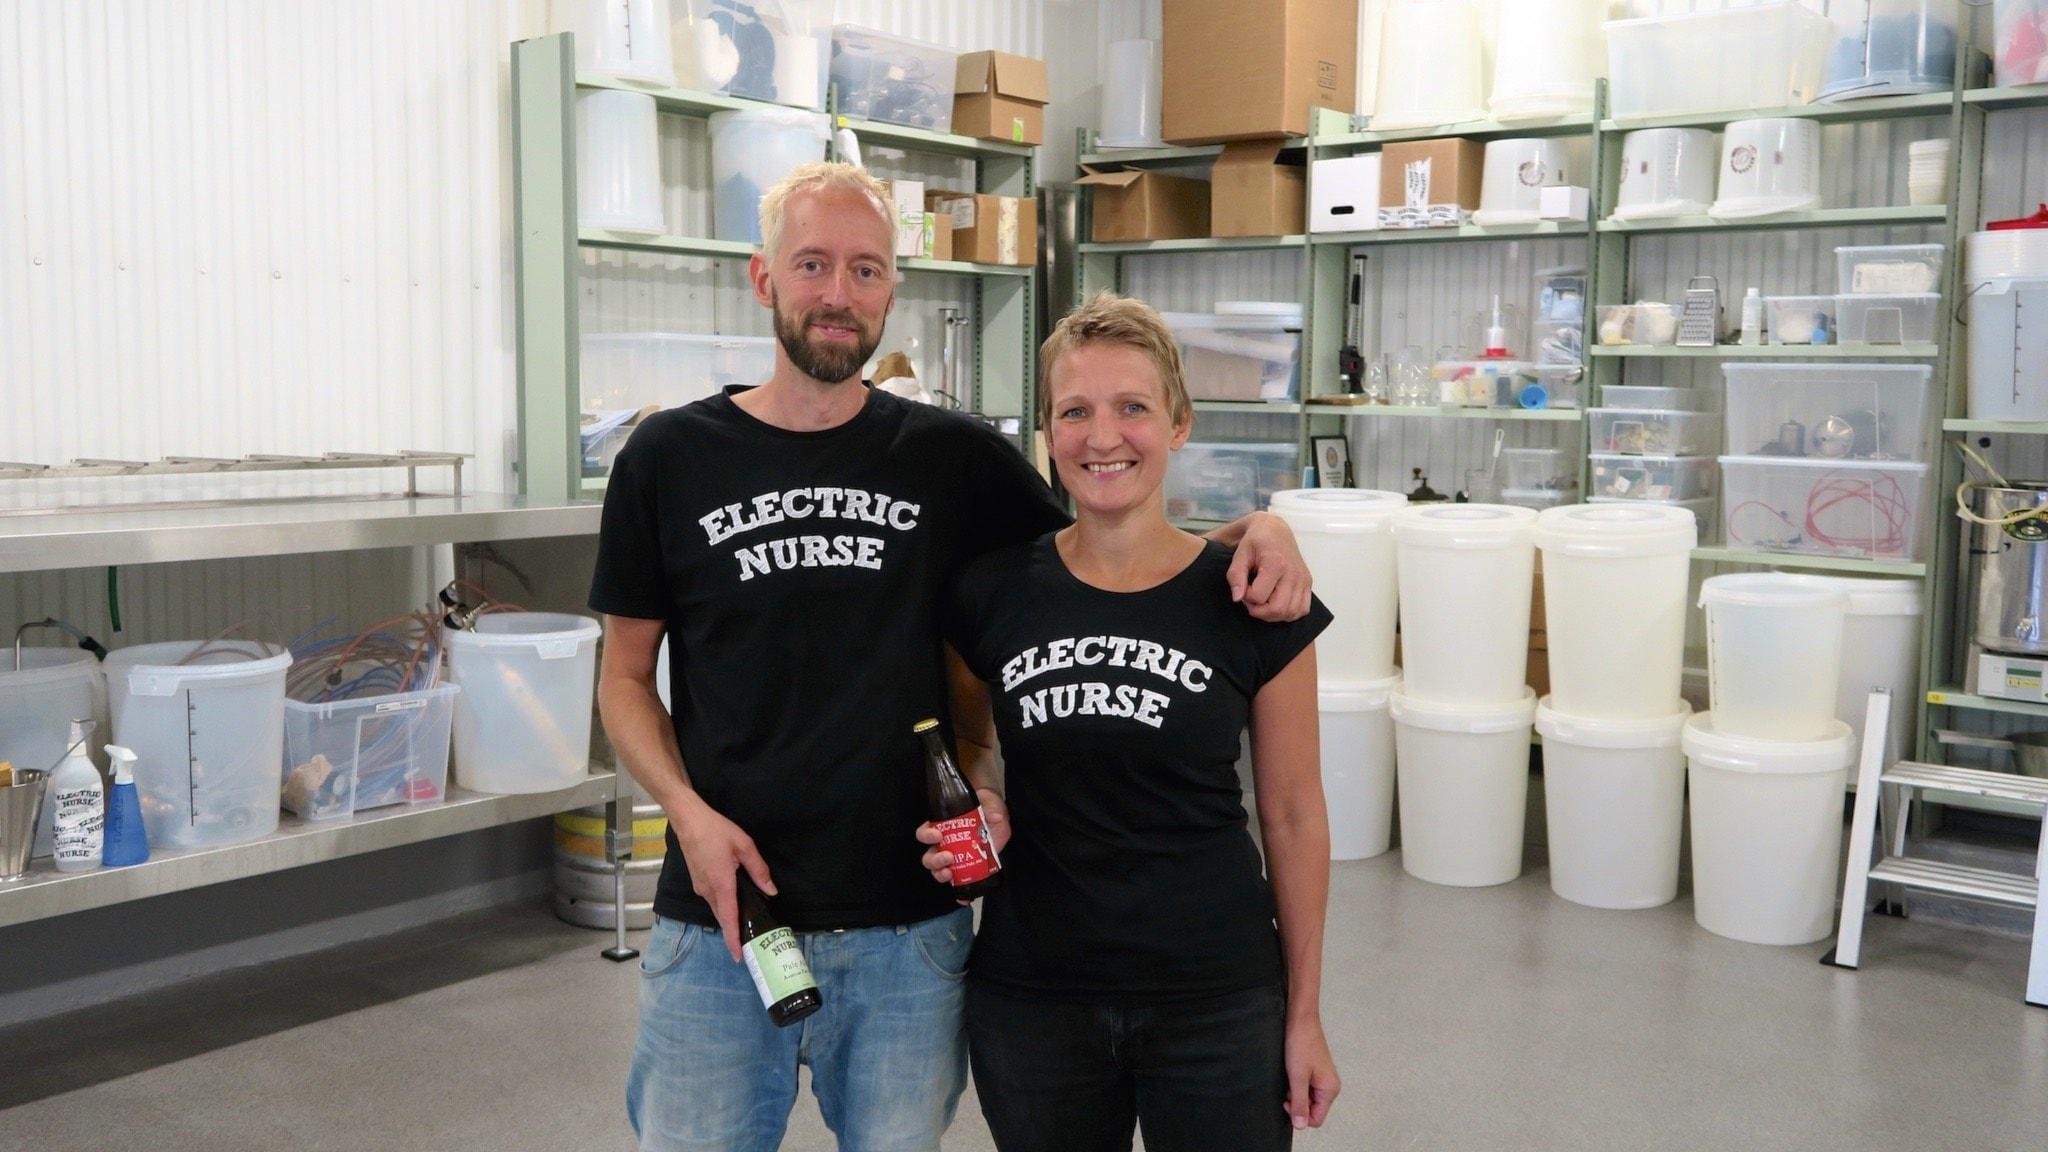 Peter Robertsson och Ida Engström driver mikrobryggeri ihop. Foto: Tomas Tengby.